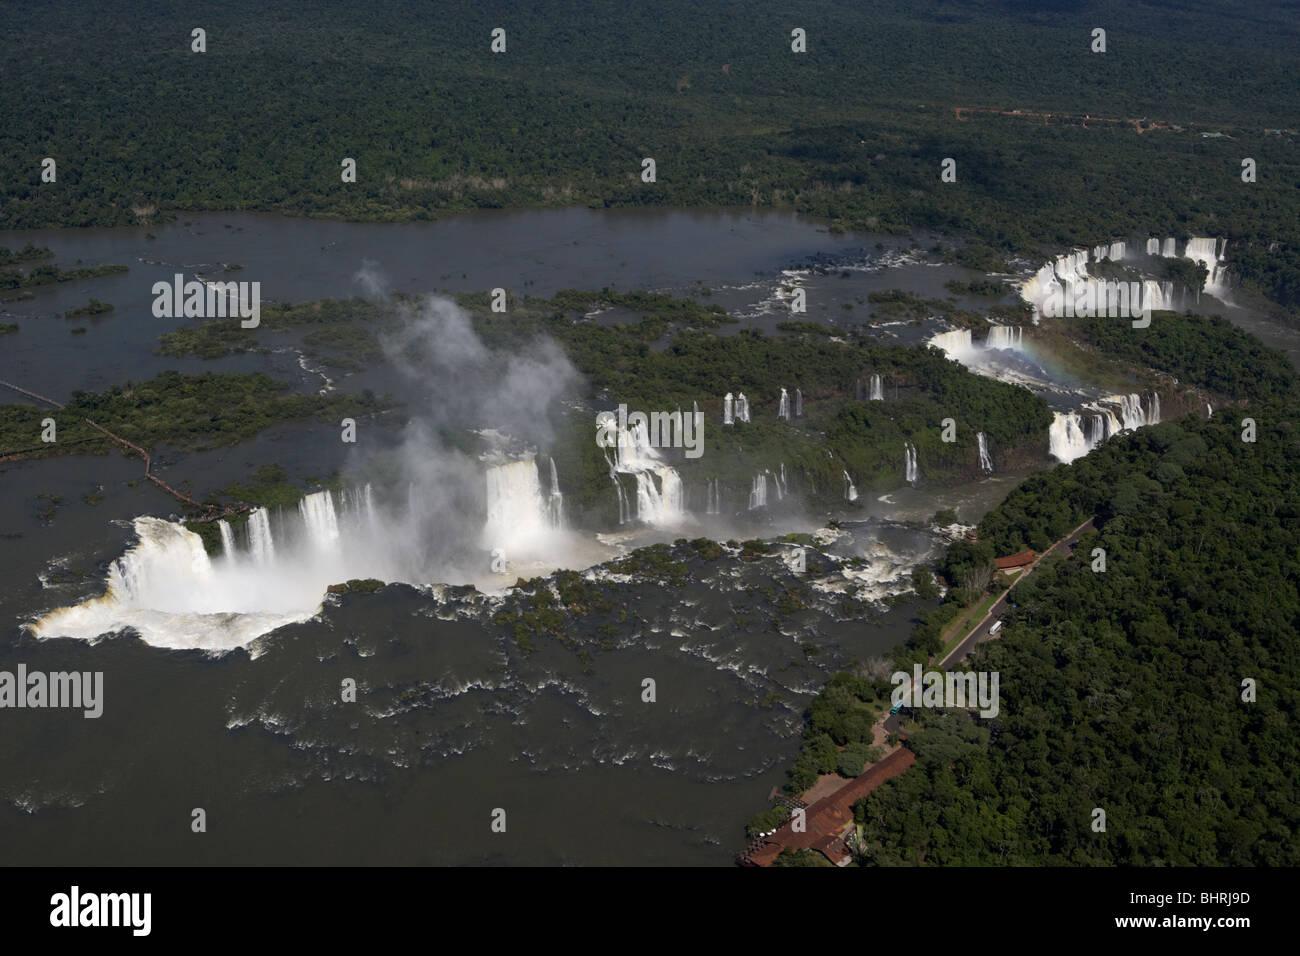 aerial view of iguazu falls and devils throat iguacu national park, parana, brazil, south america - Stock Image